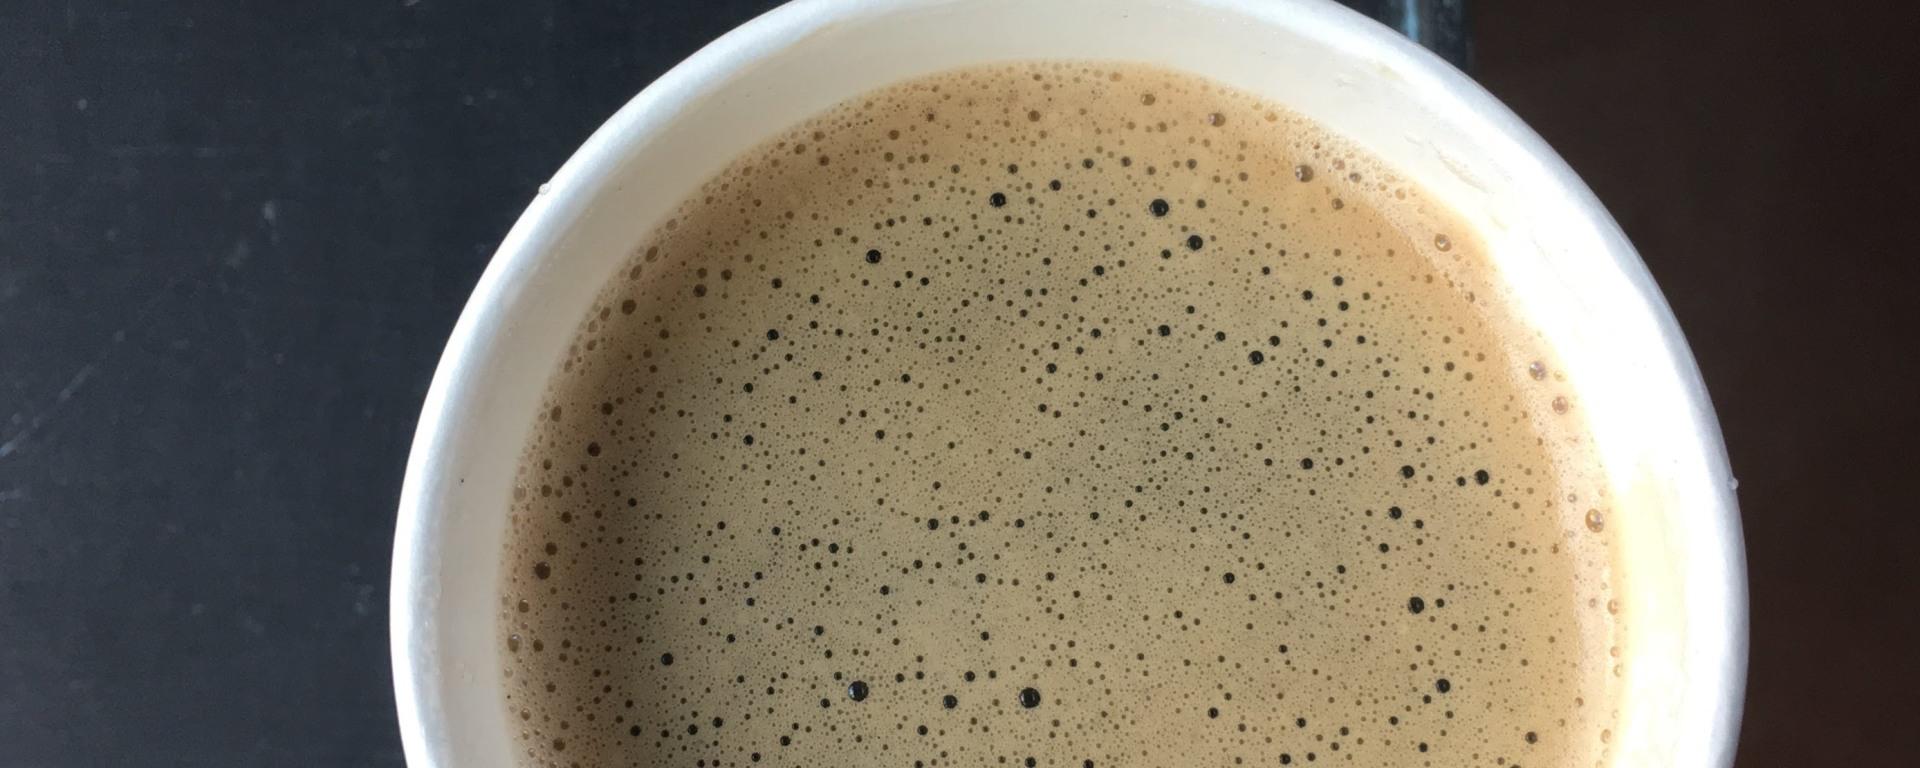 random coffee fact 1 southern coffee enthusiast